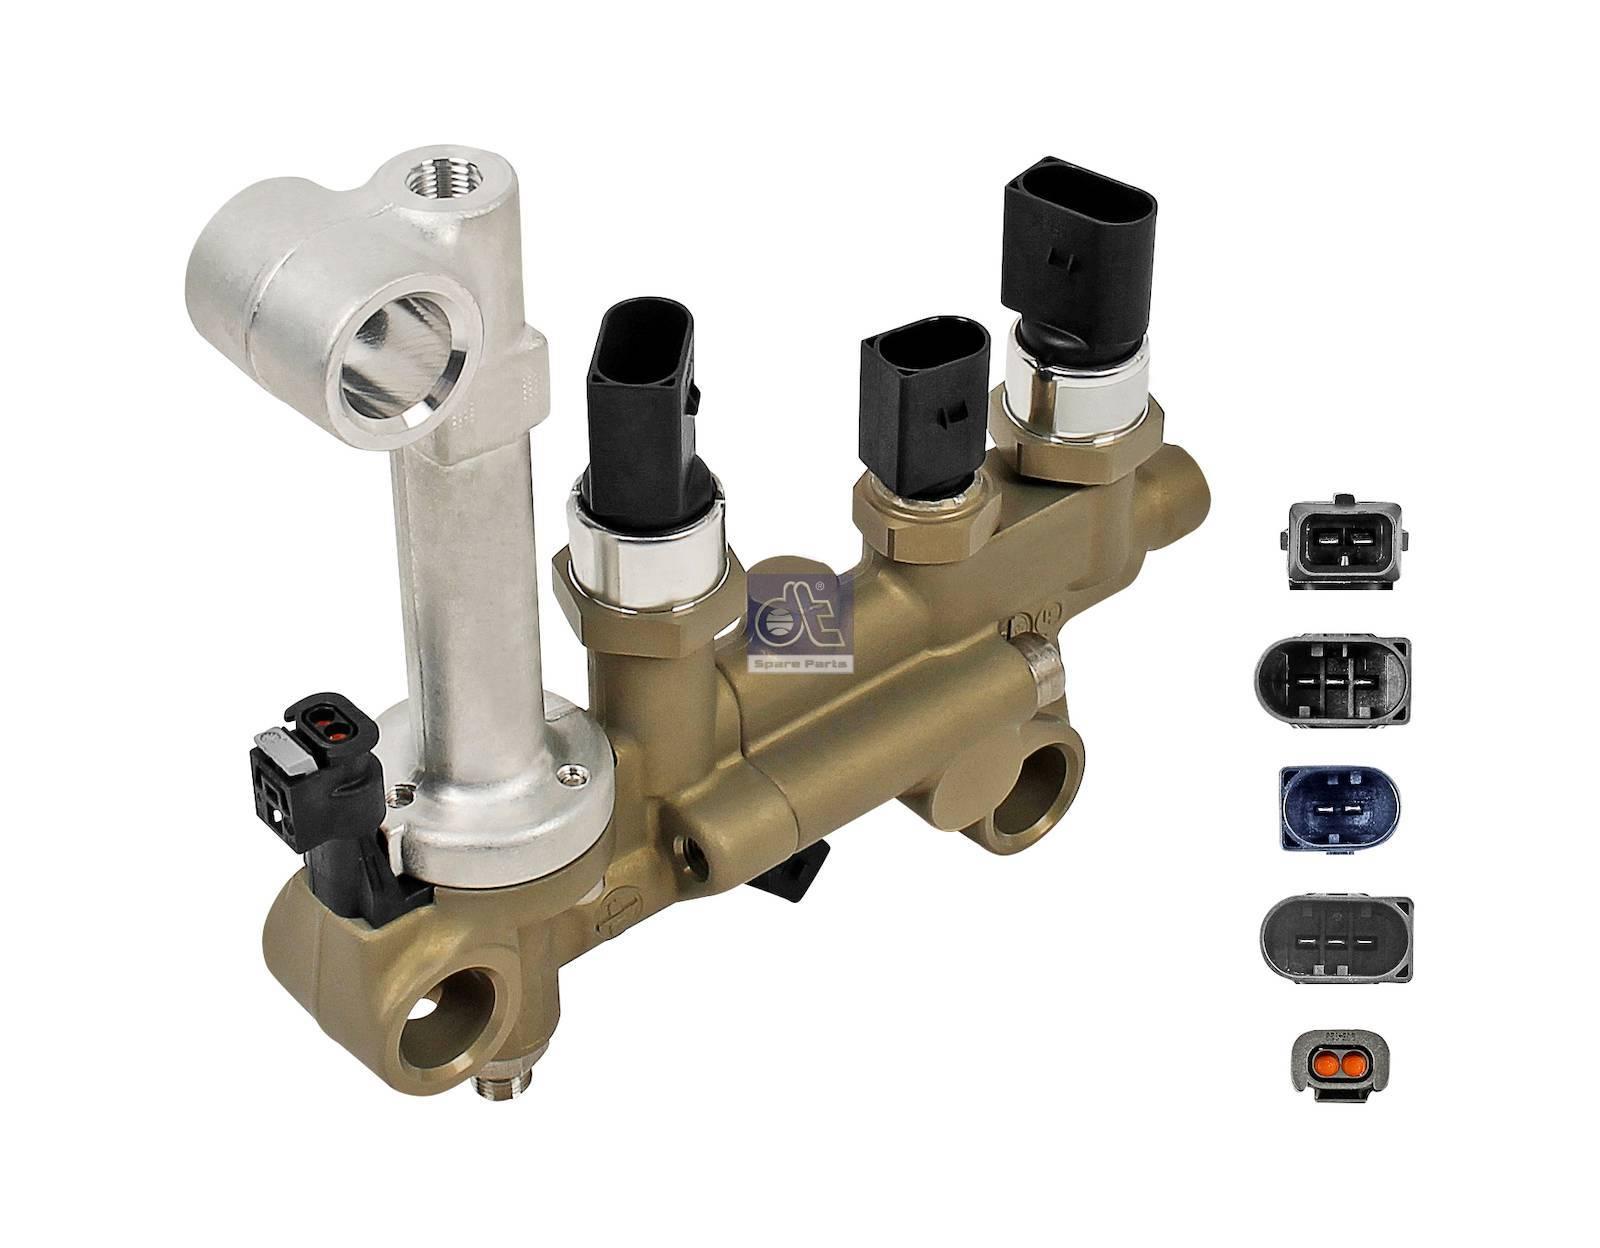 DT 4 69783 Dosing module, urea injection 0001404139 suitable for